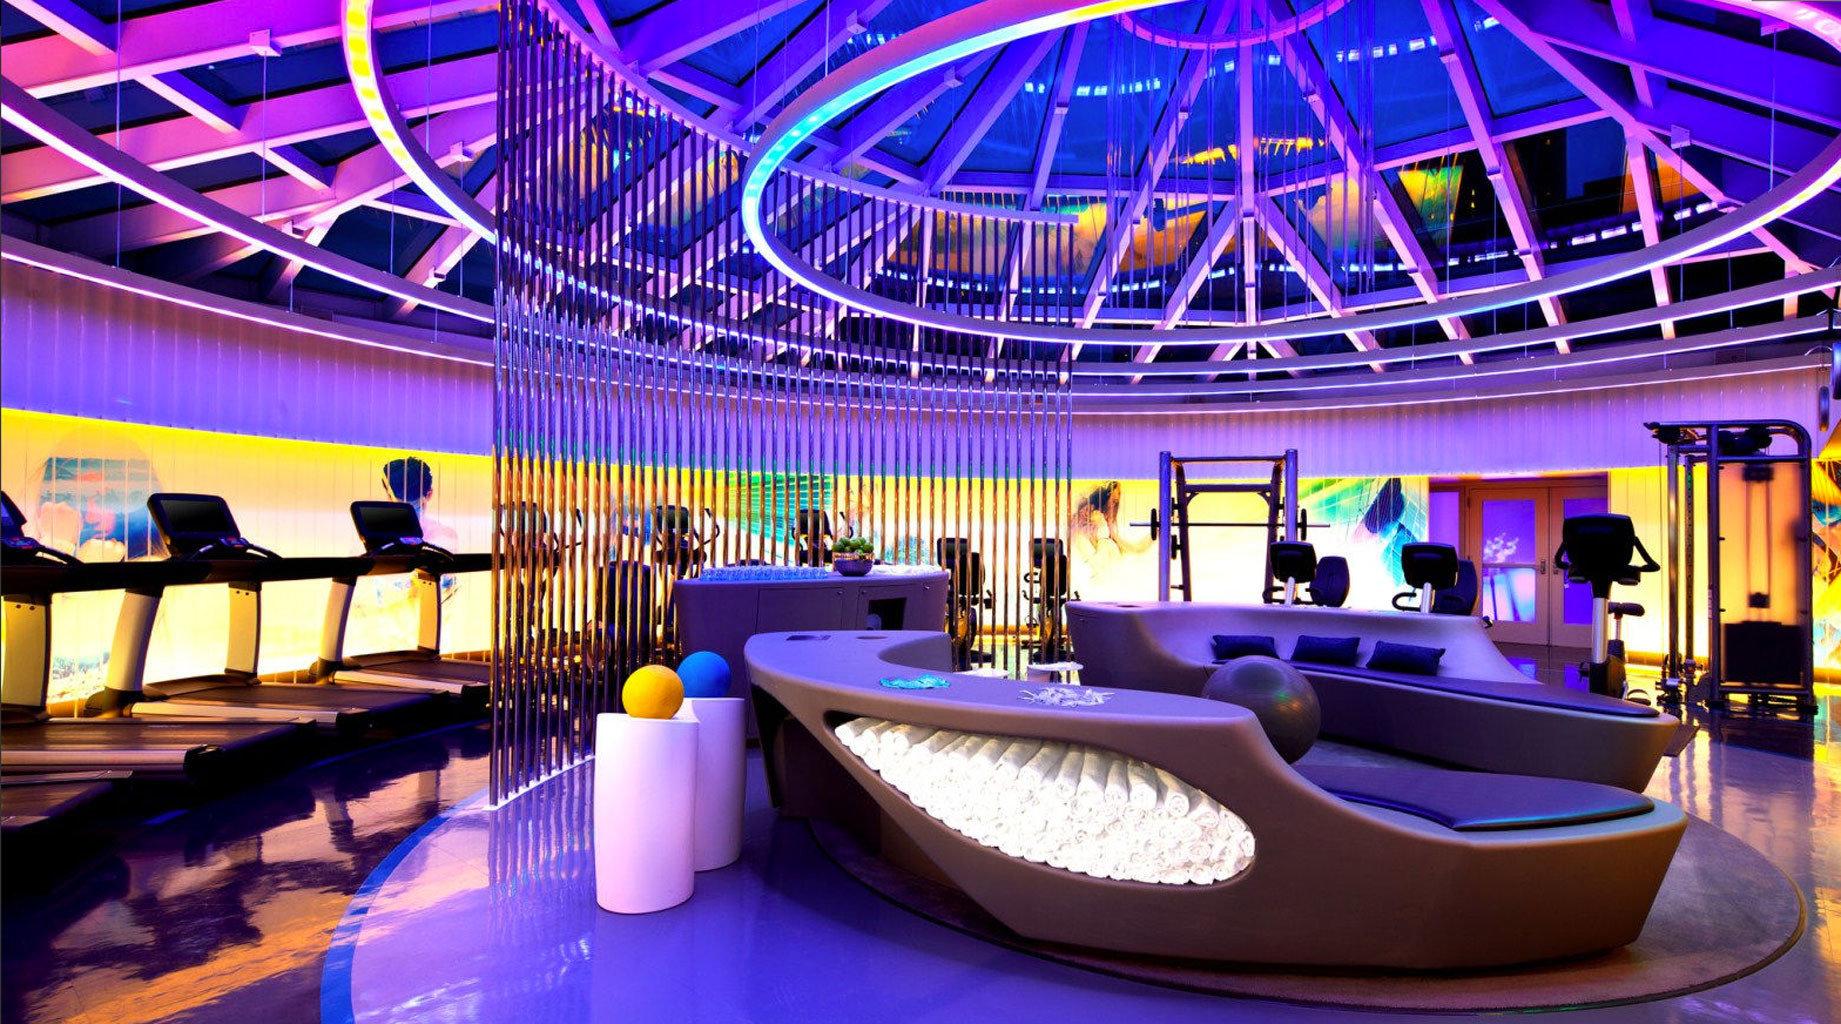 leisure function hall convention center nightclub Resort auditorium